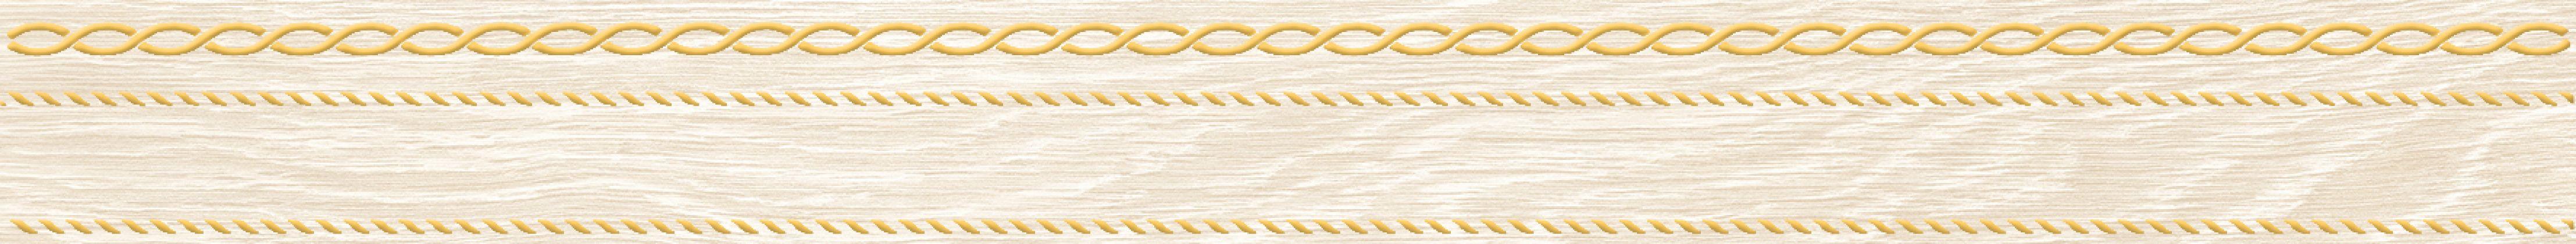 Genesis Бордюр бежевый 6x60